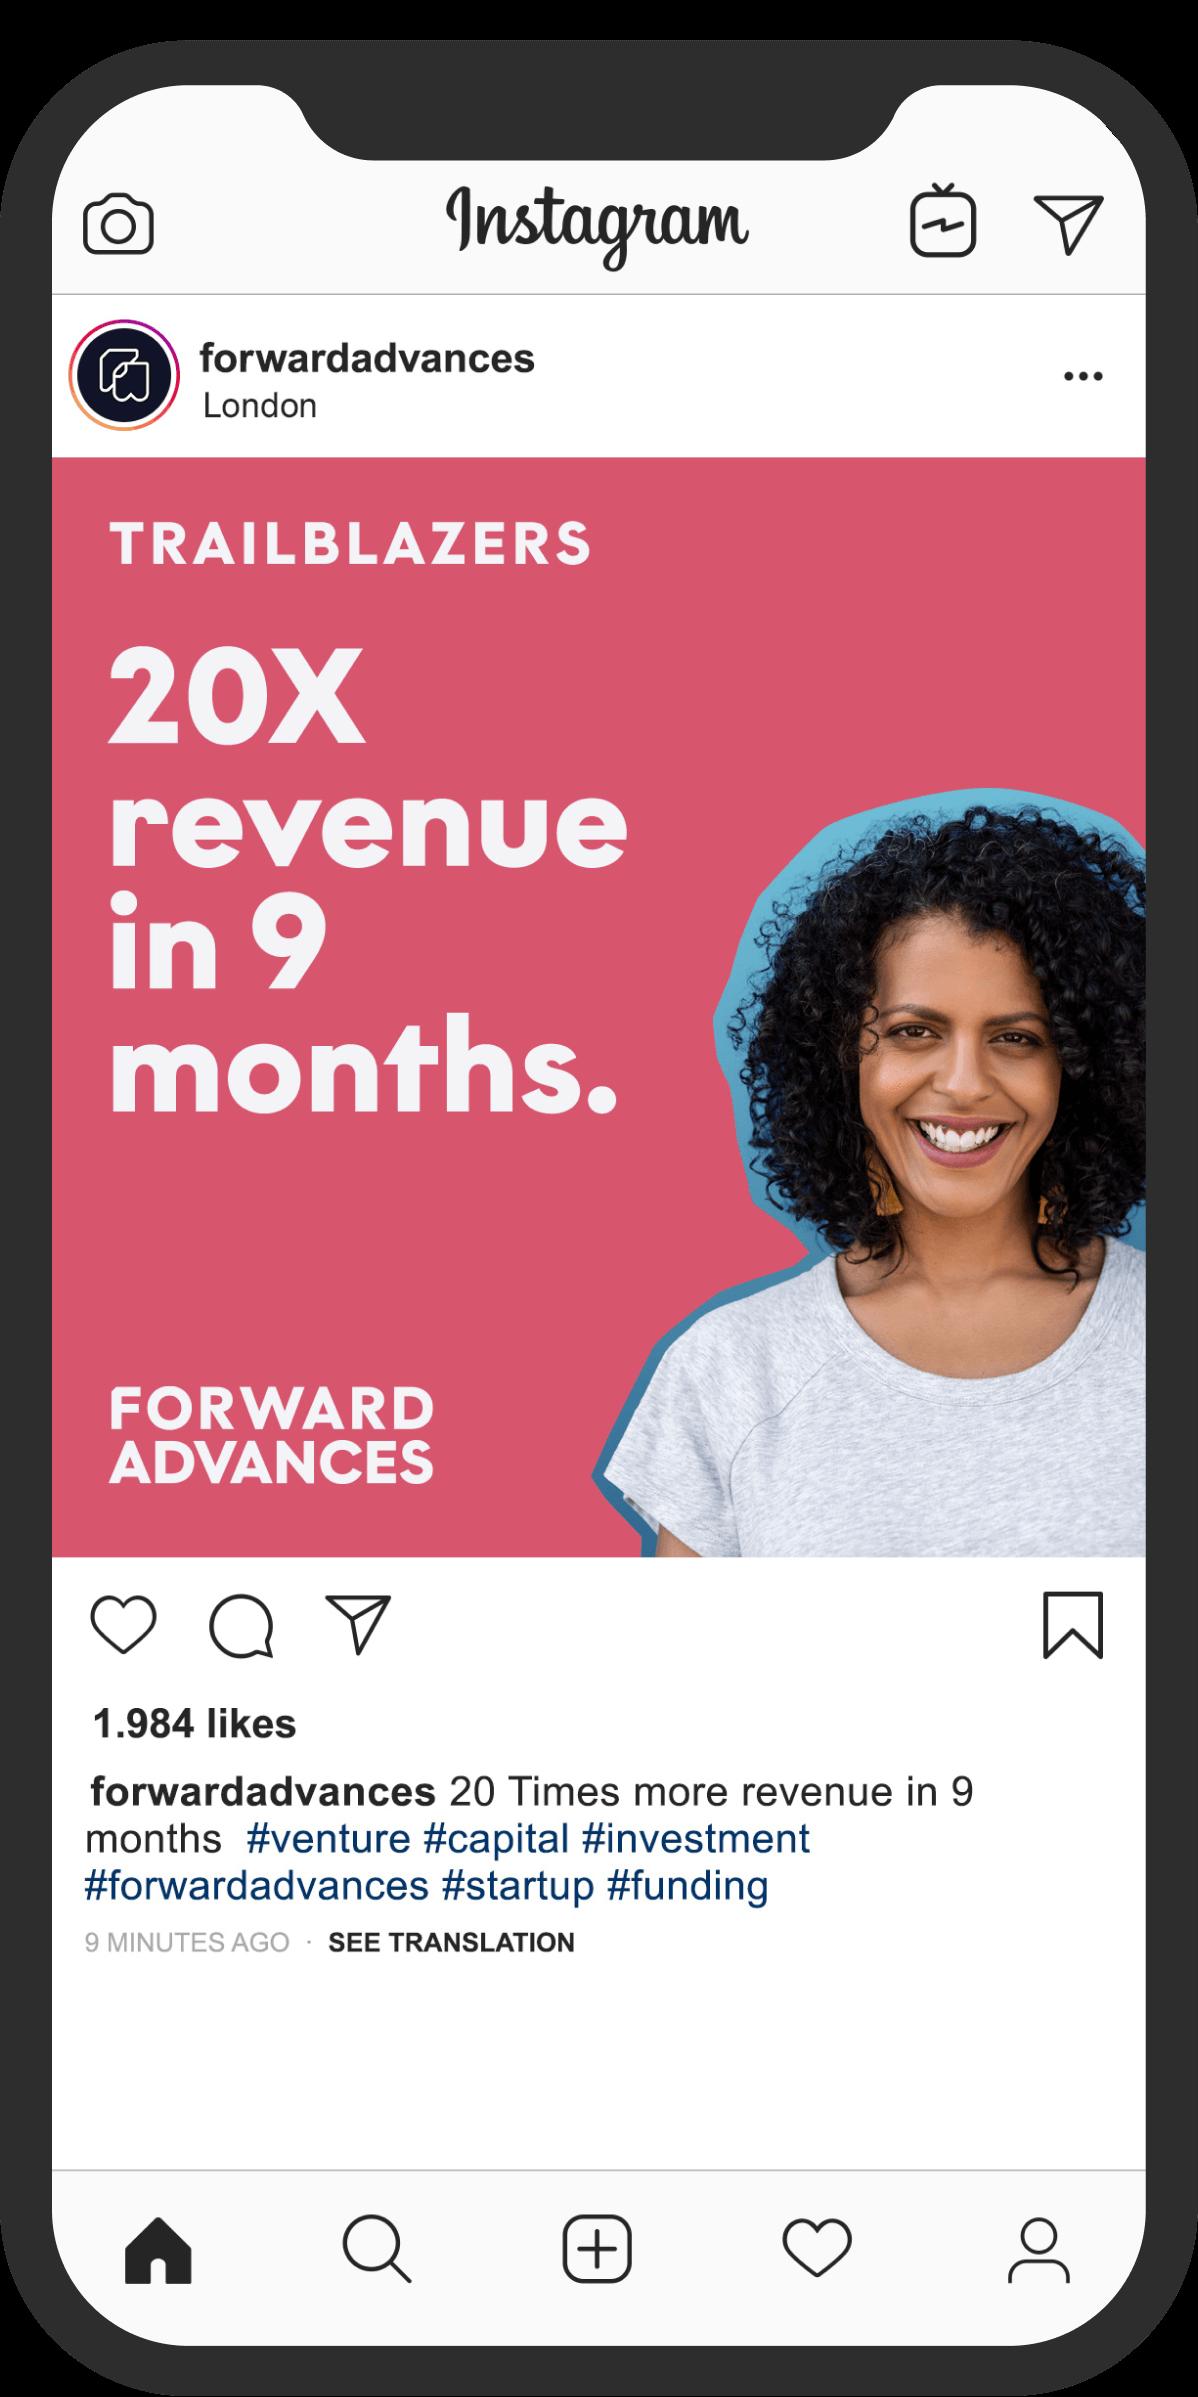 Forward Advances instagram ad in phone mockup.